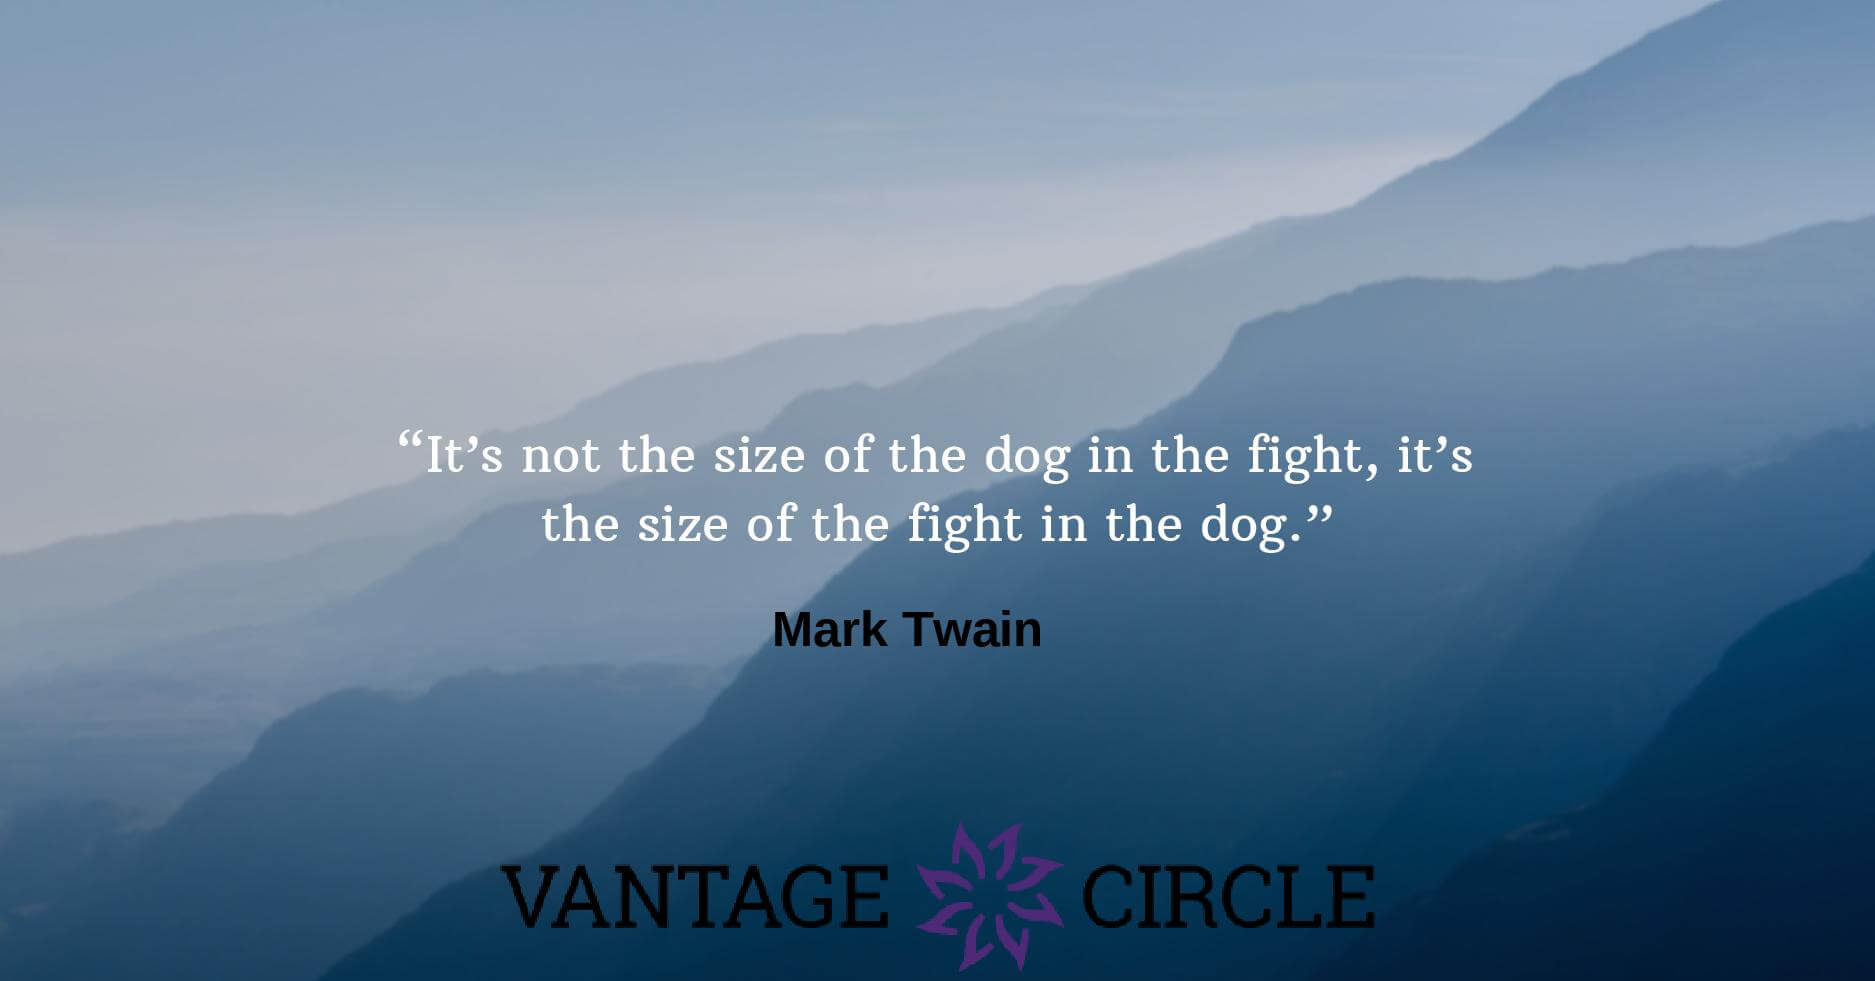 Employee-motivational-quotes-Mark-twain